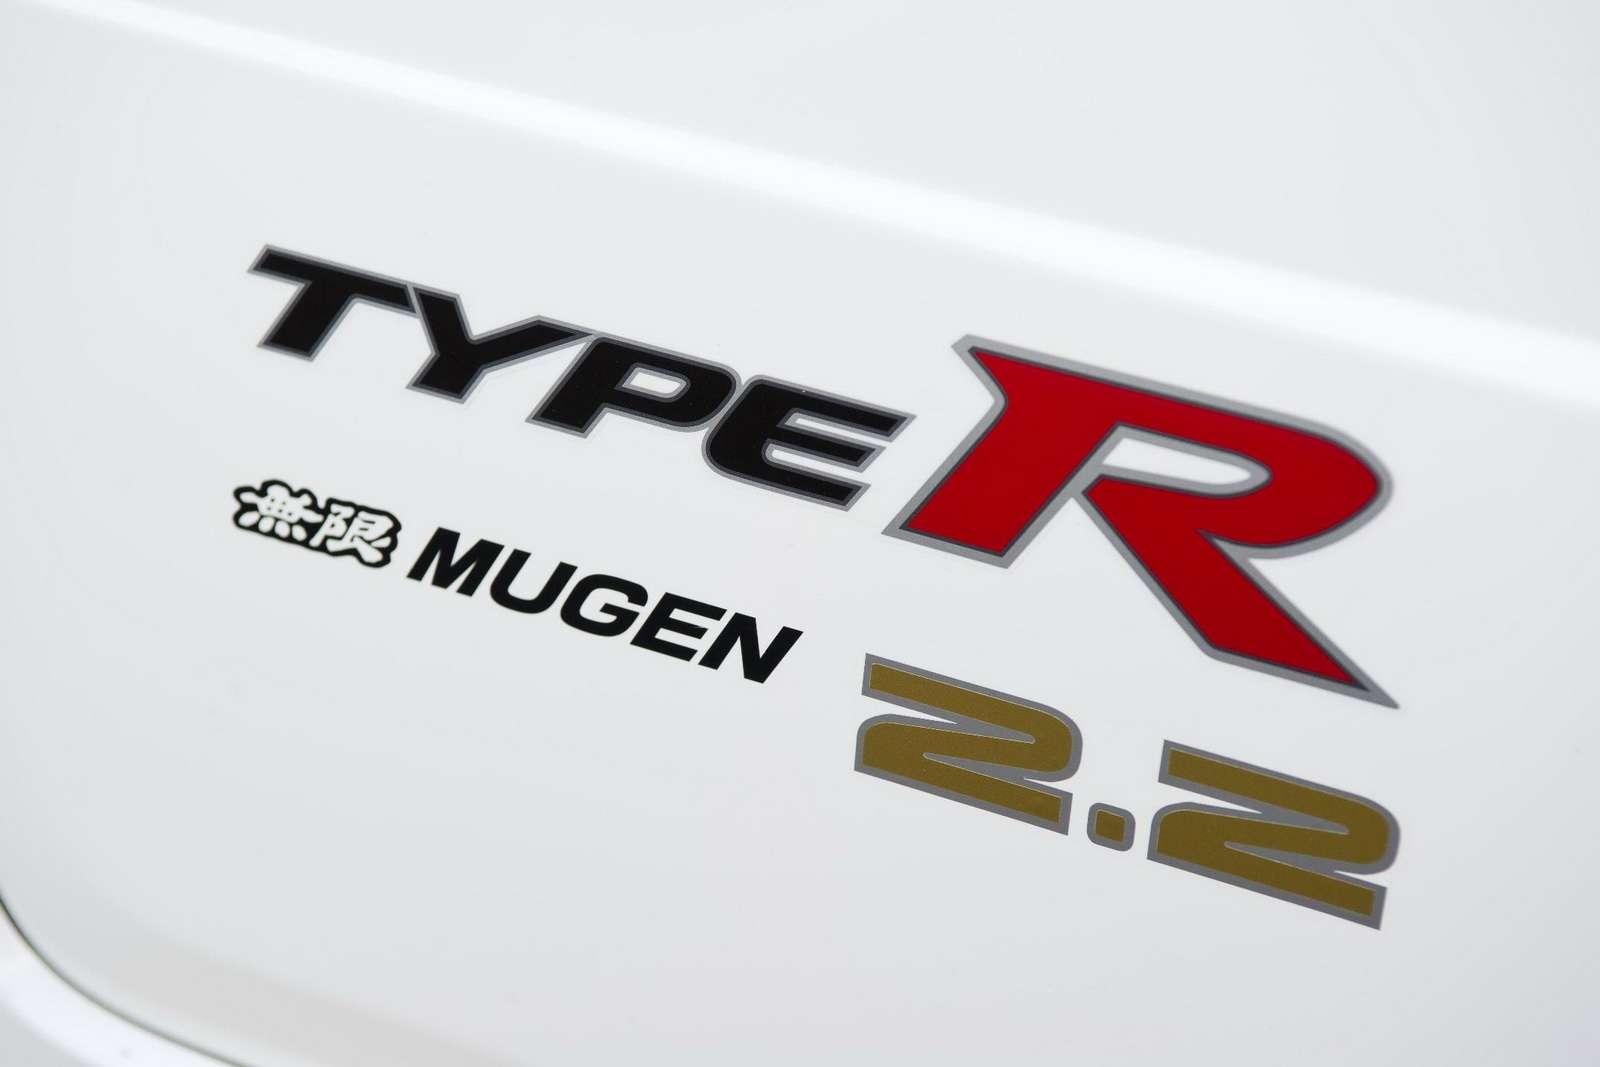 Honda Civic Type R MUGEN 22 fot wrzesien 2011